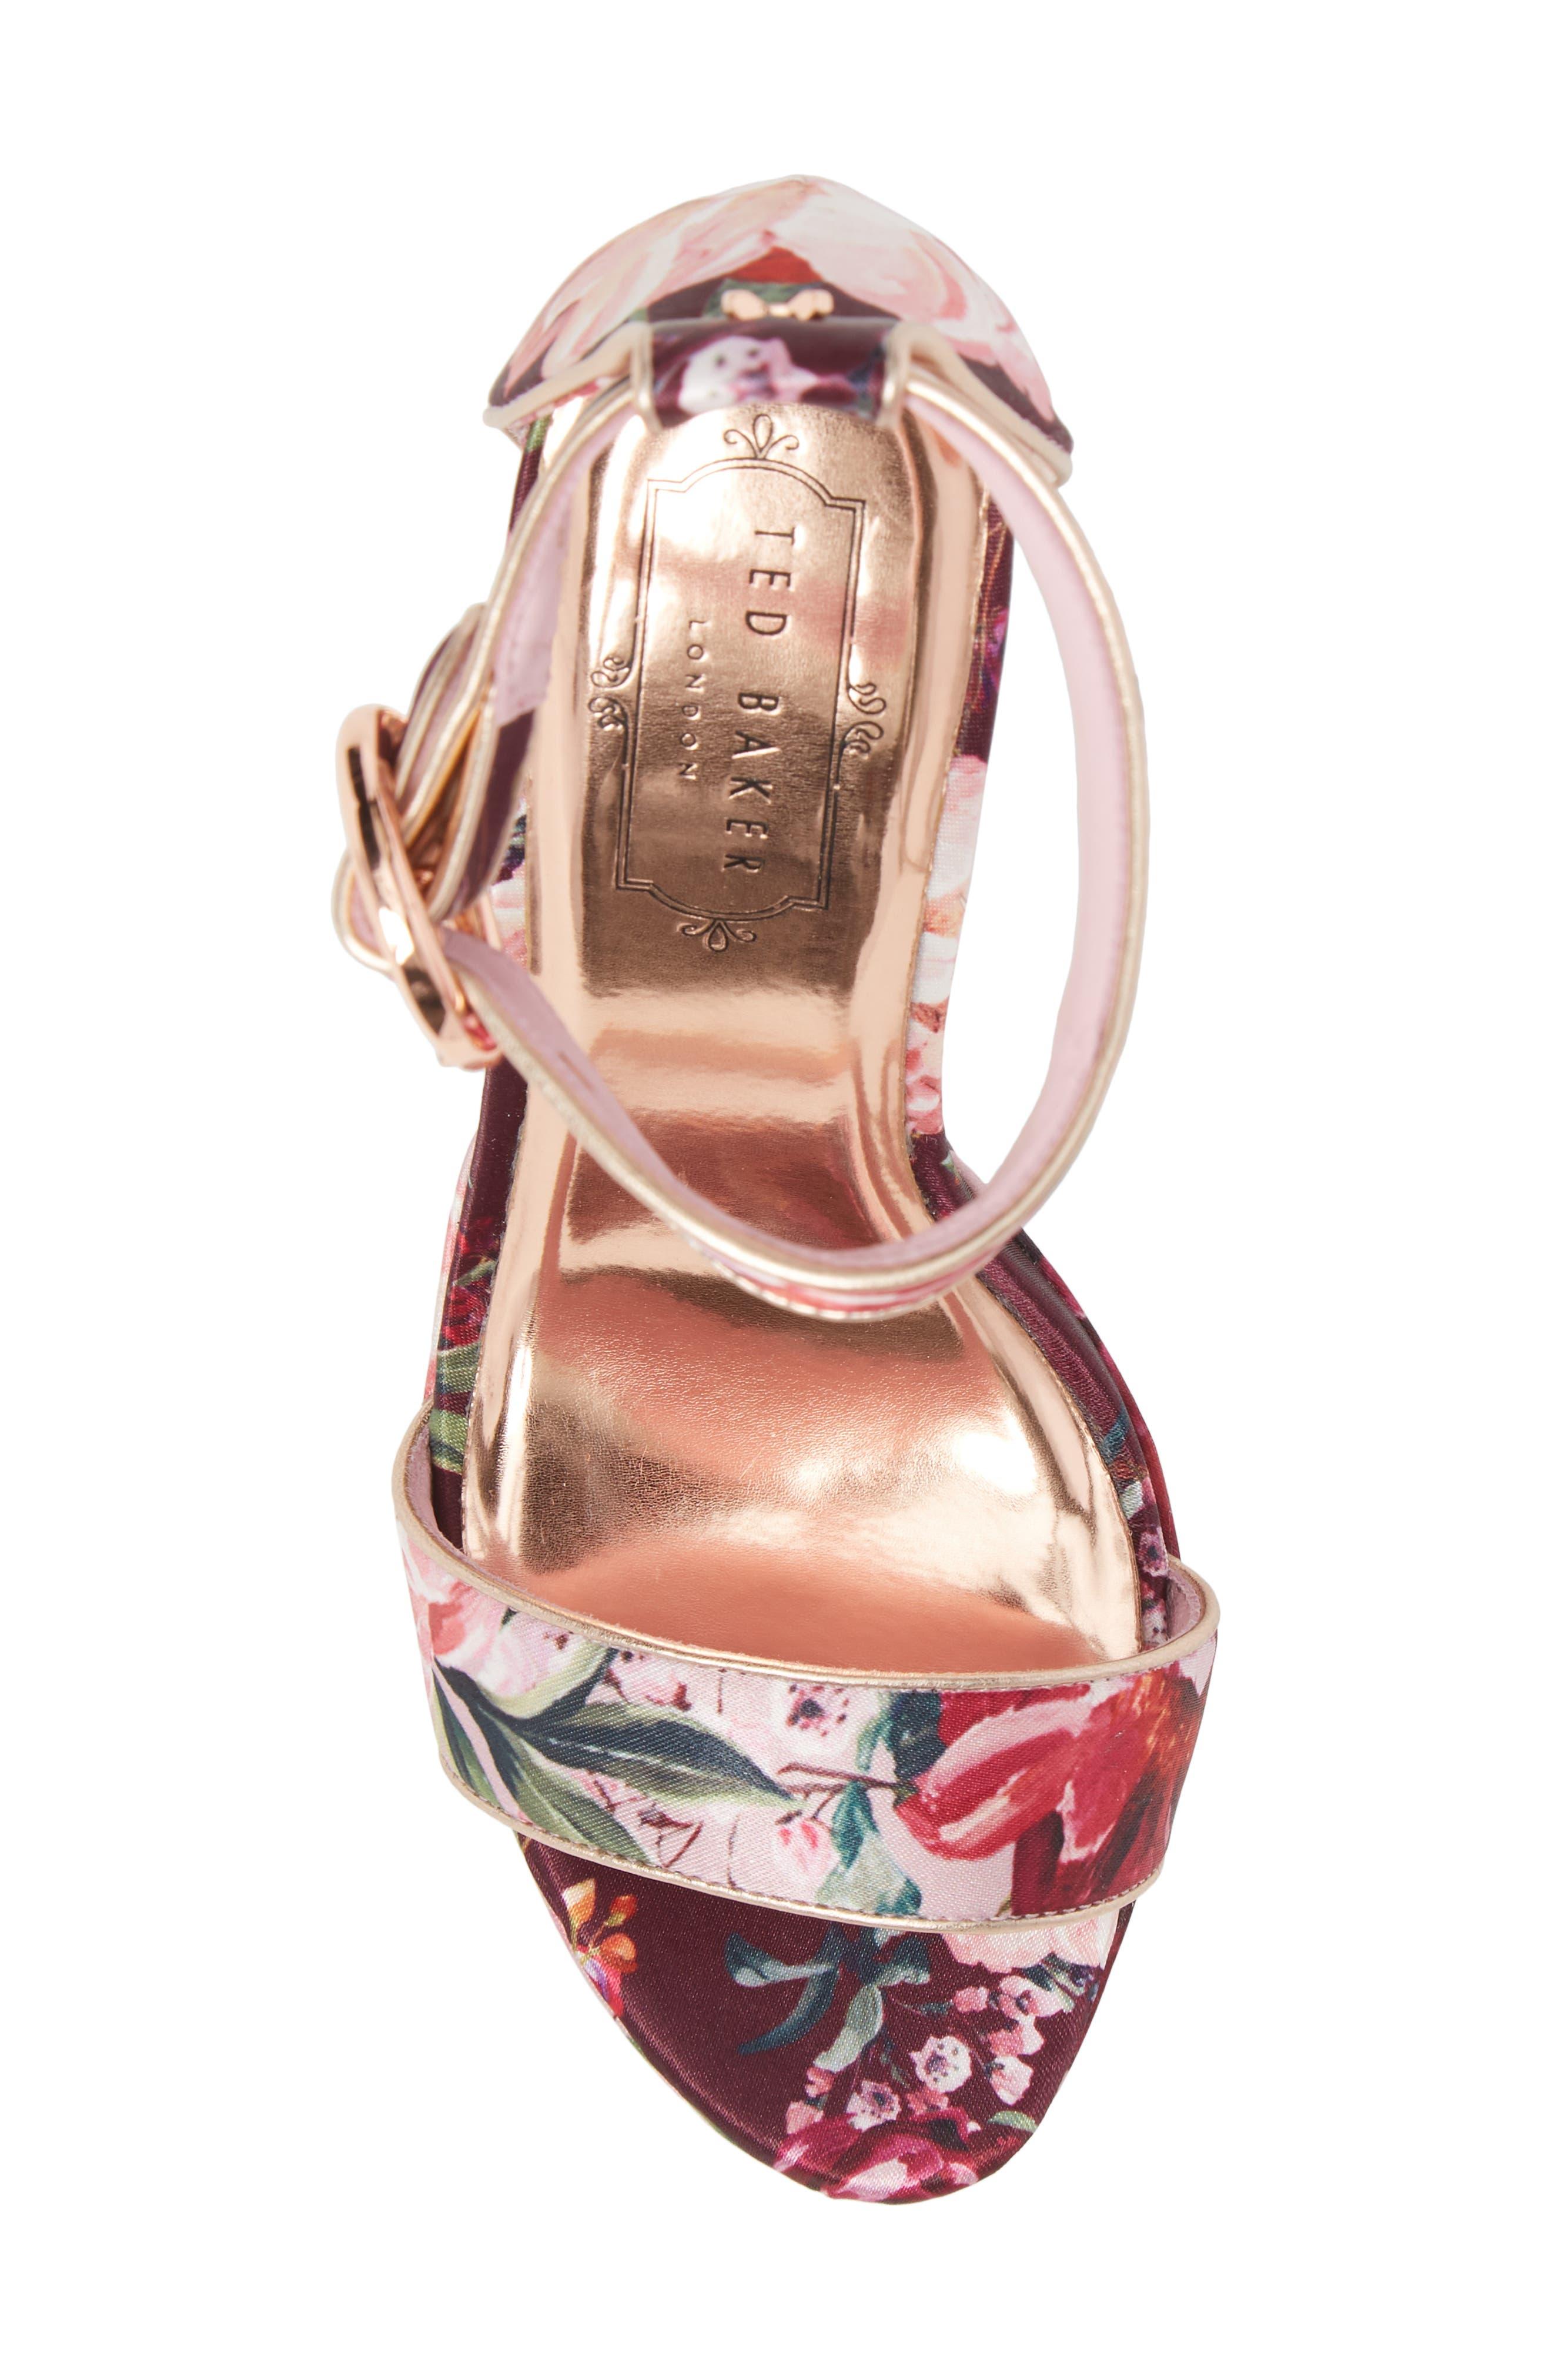 Jewll Ankle Strap Sandal,                             Alternate thumbnail 5, color,                             Serenity Satin